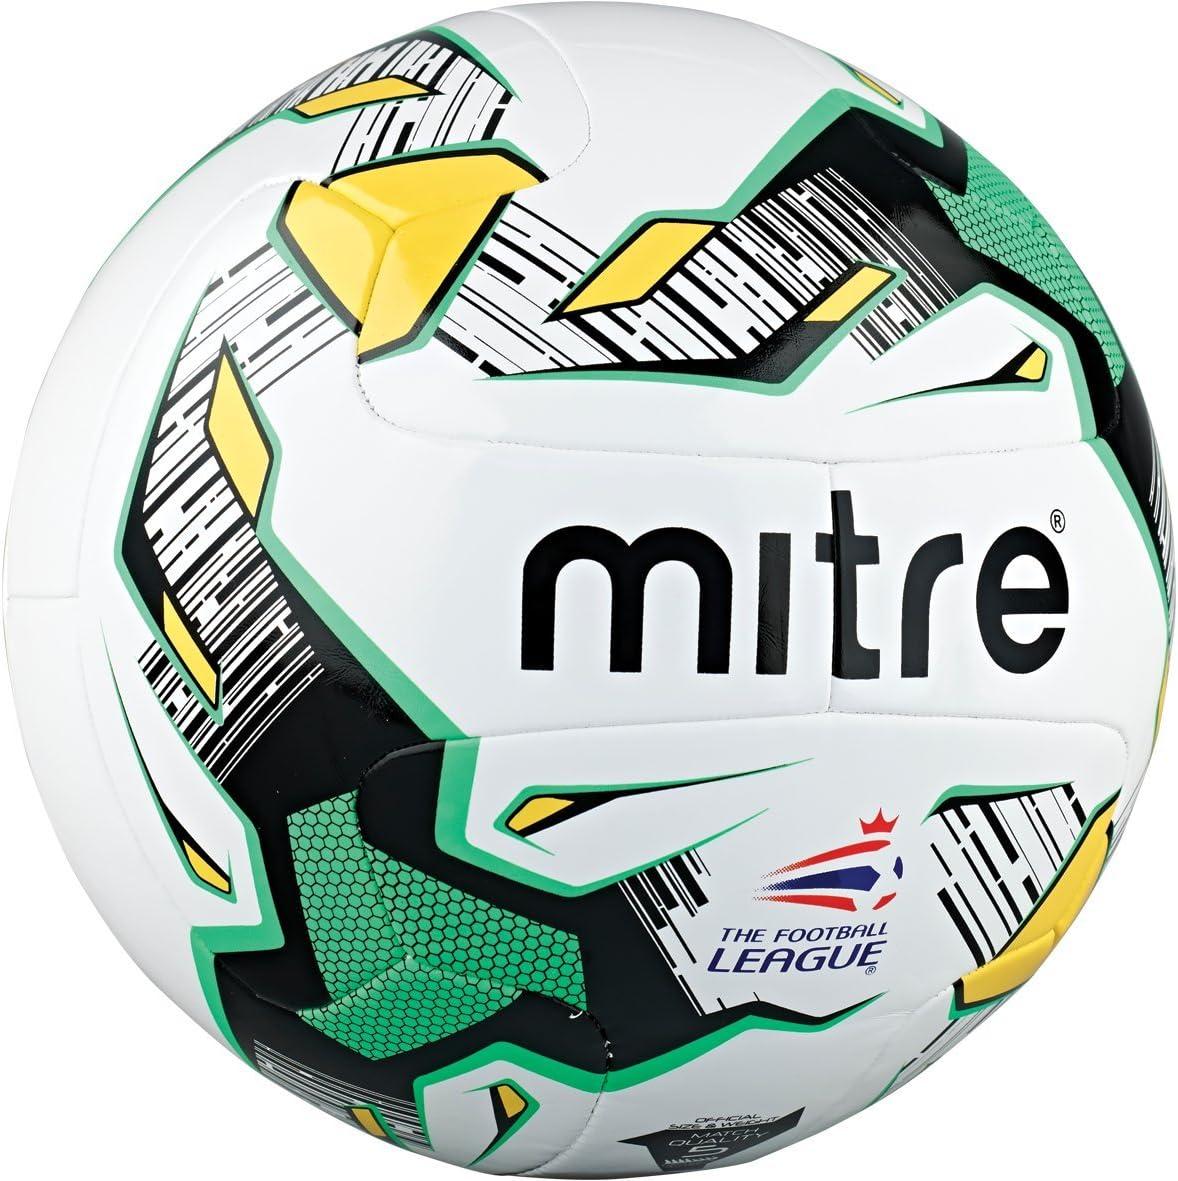 Mitre Delta Hyperseam - Balón de fútbol, Color White/Black/Yellow/Green, tamaño Talla 5: Amazon.es: Deportes y aire libre